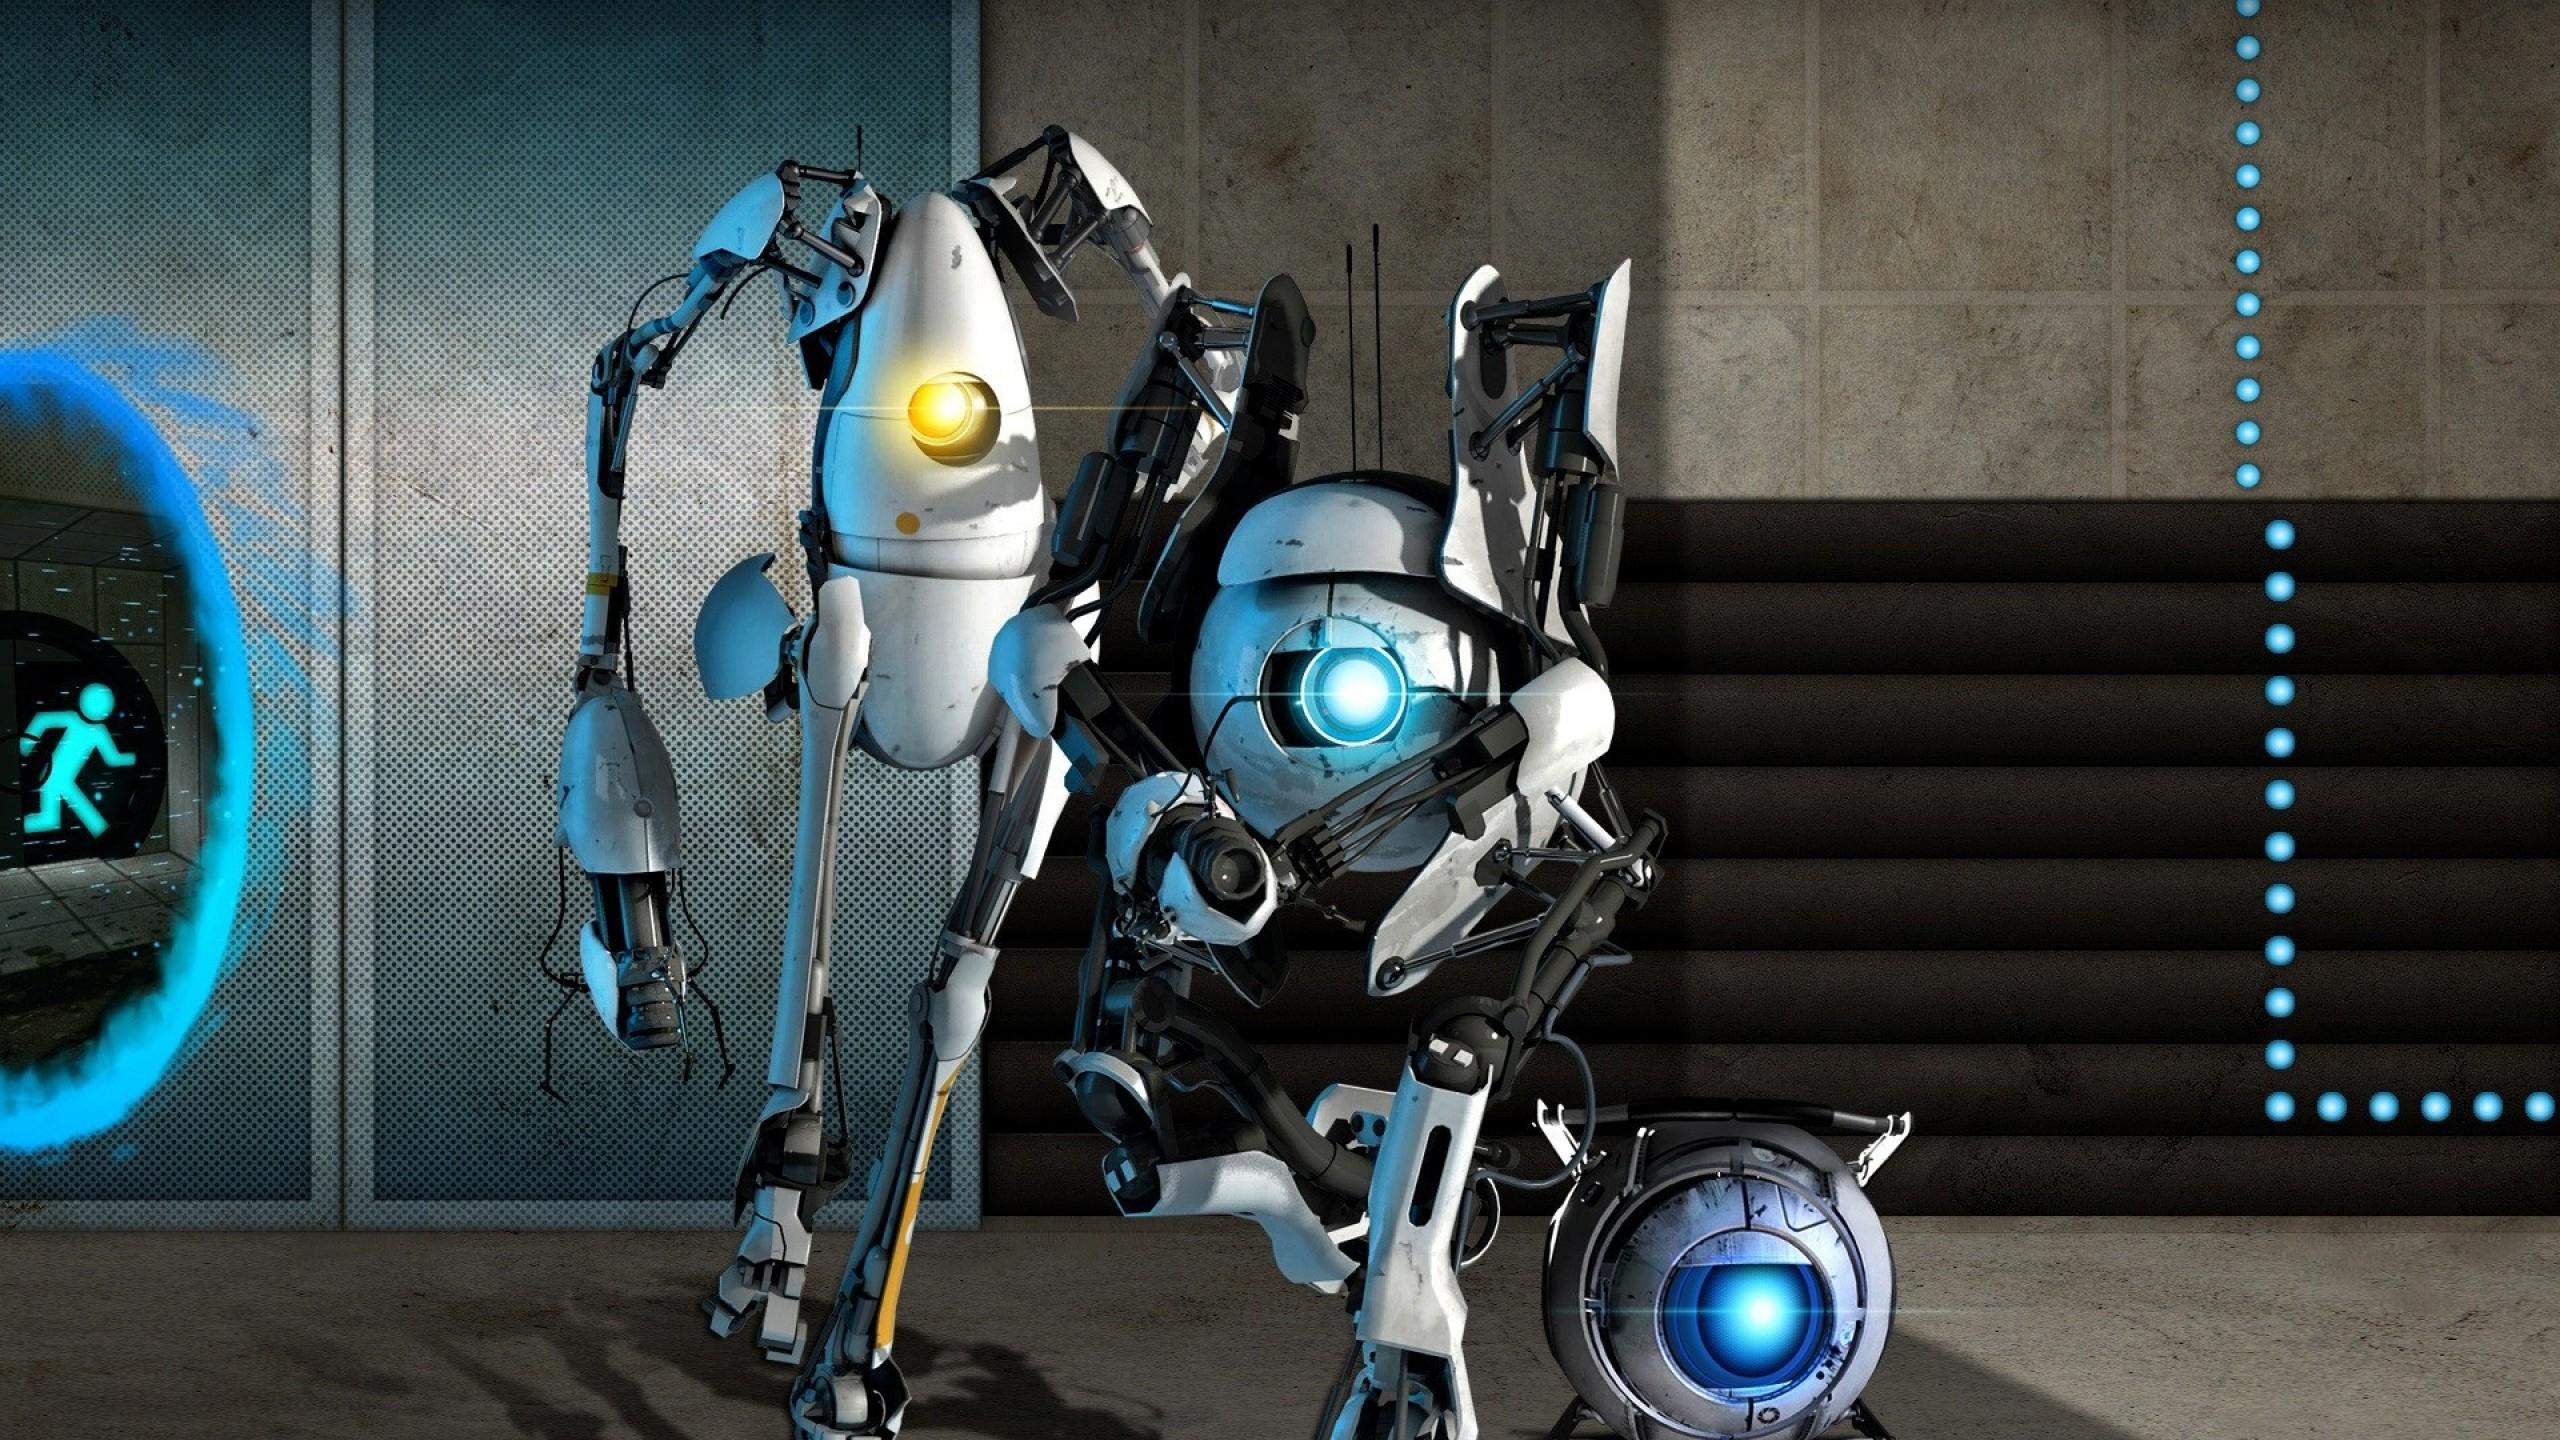 Wallpaper portal 2, robots, light, wall, door